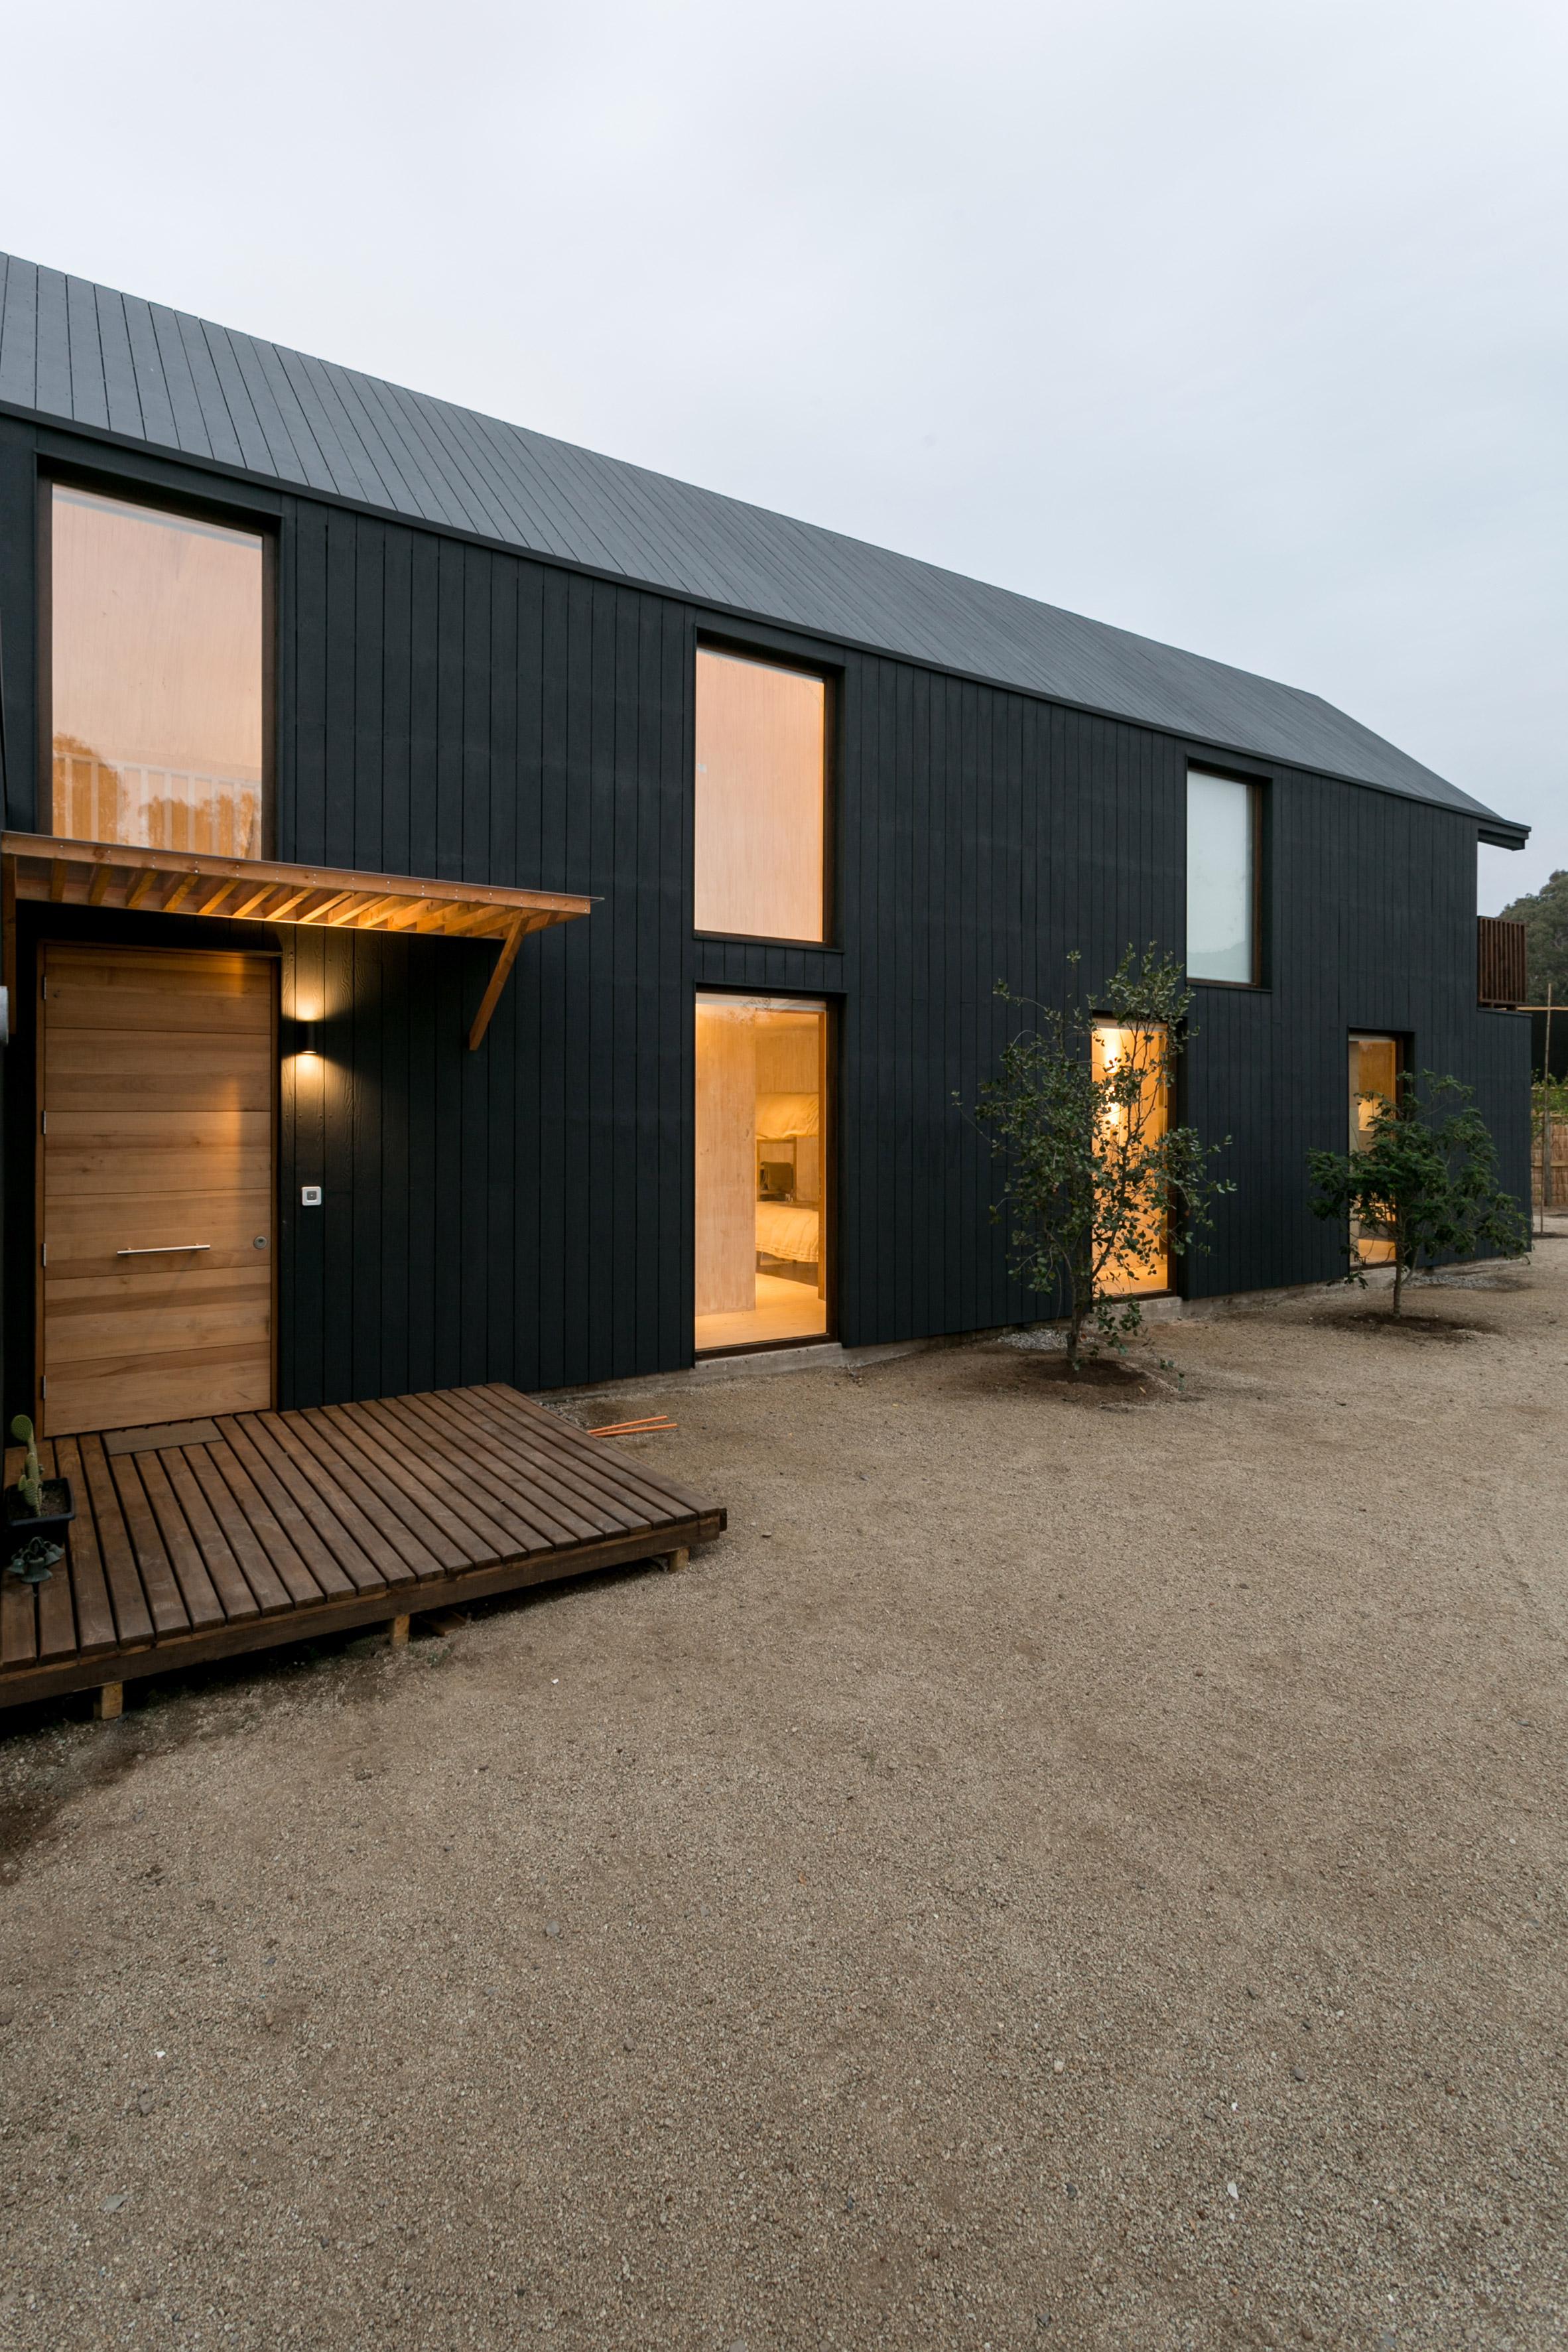 shotgun-house-alejandro-soffia-architecture-black-wood-chile_dezeen_2364_col_16.jpg